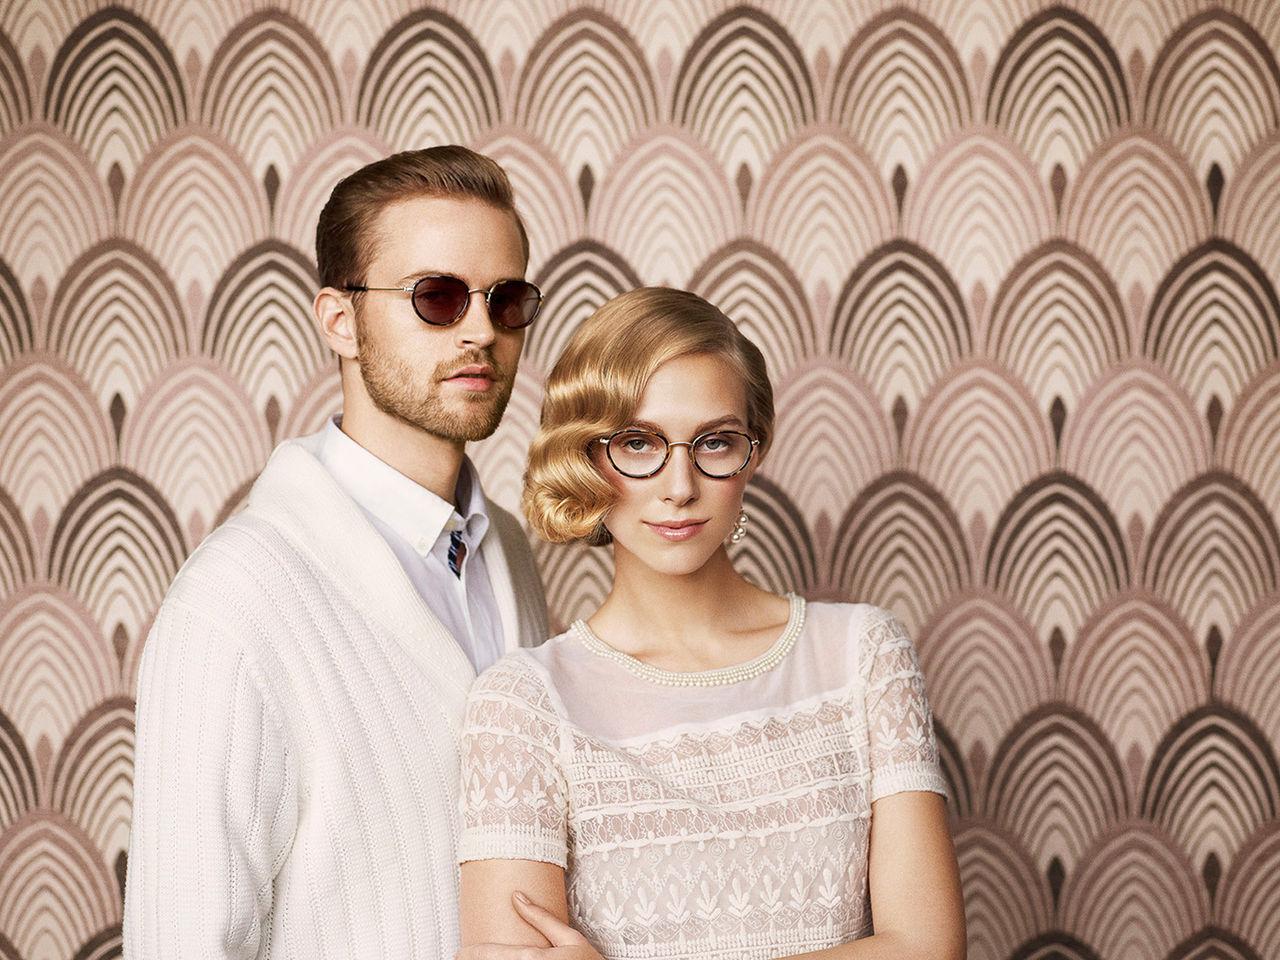 20-talet som gäller enligt Warby Parker